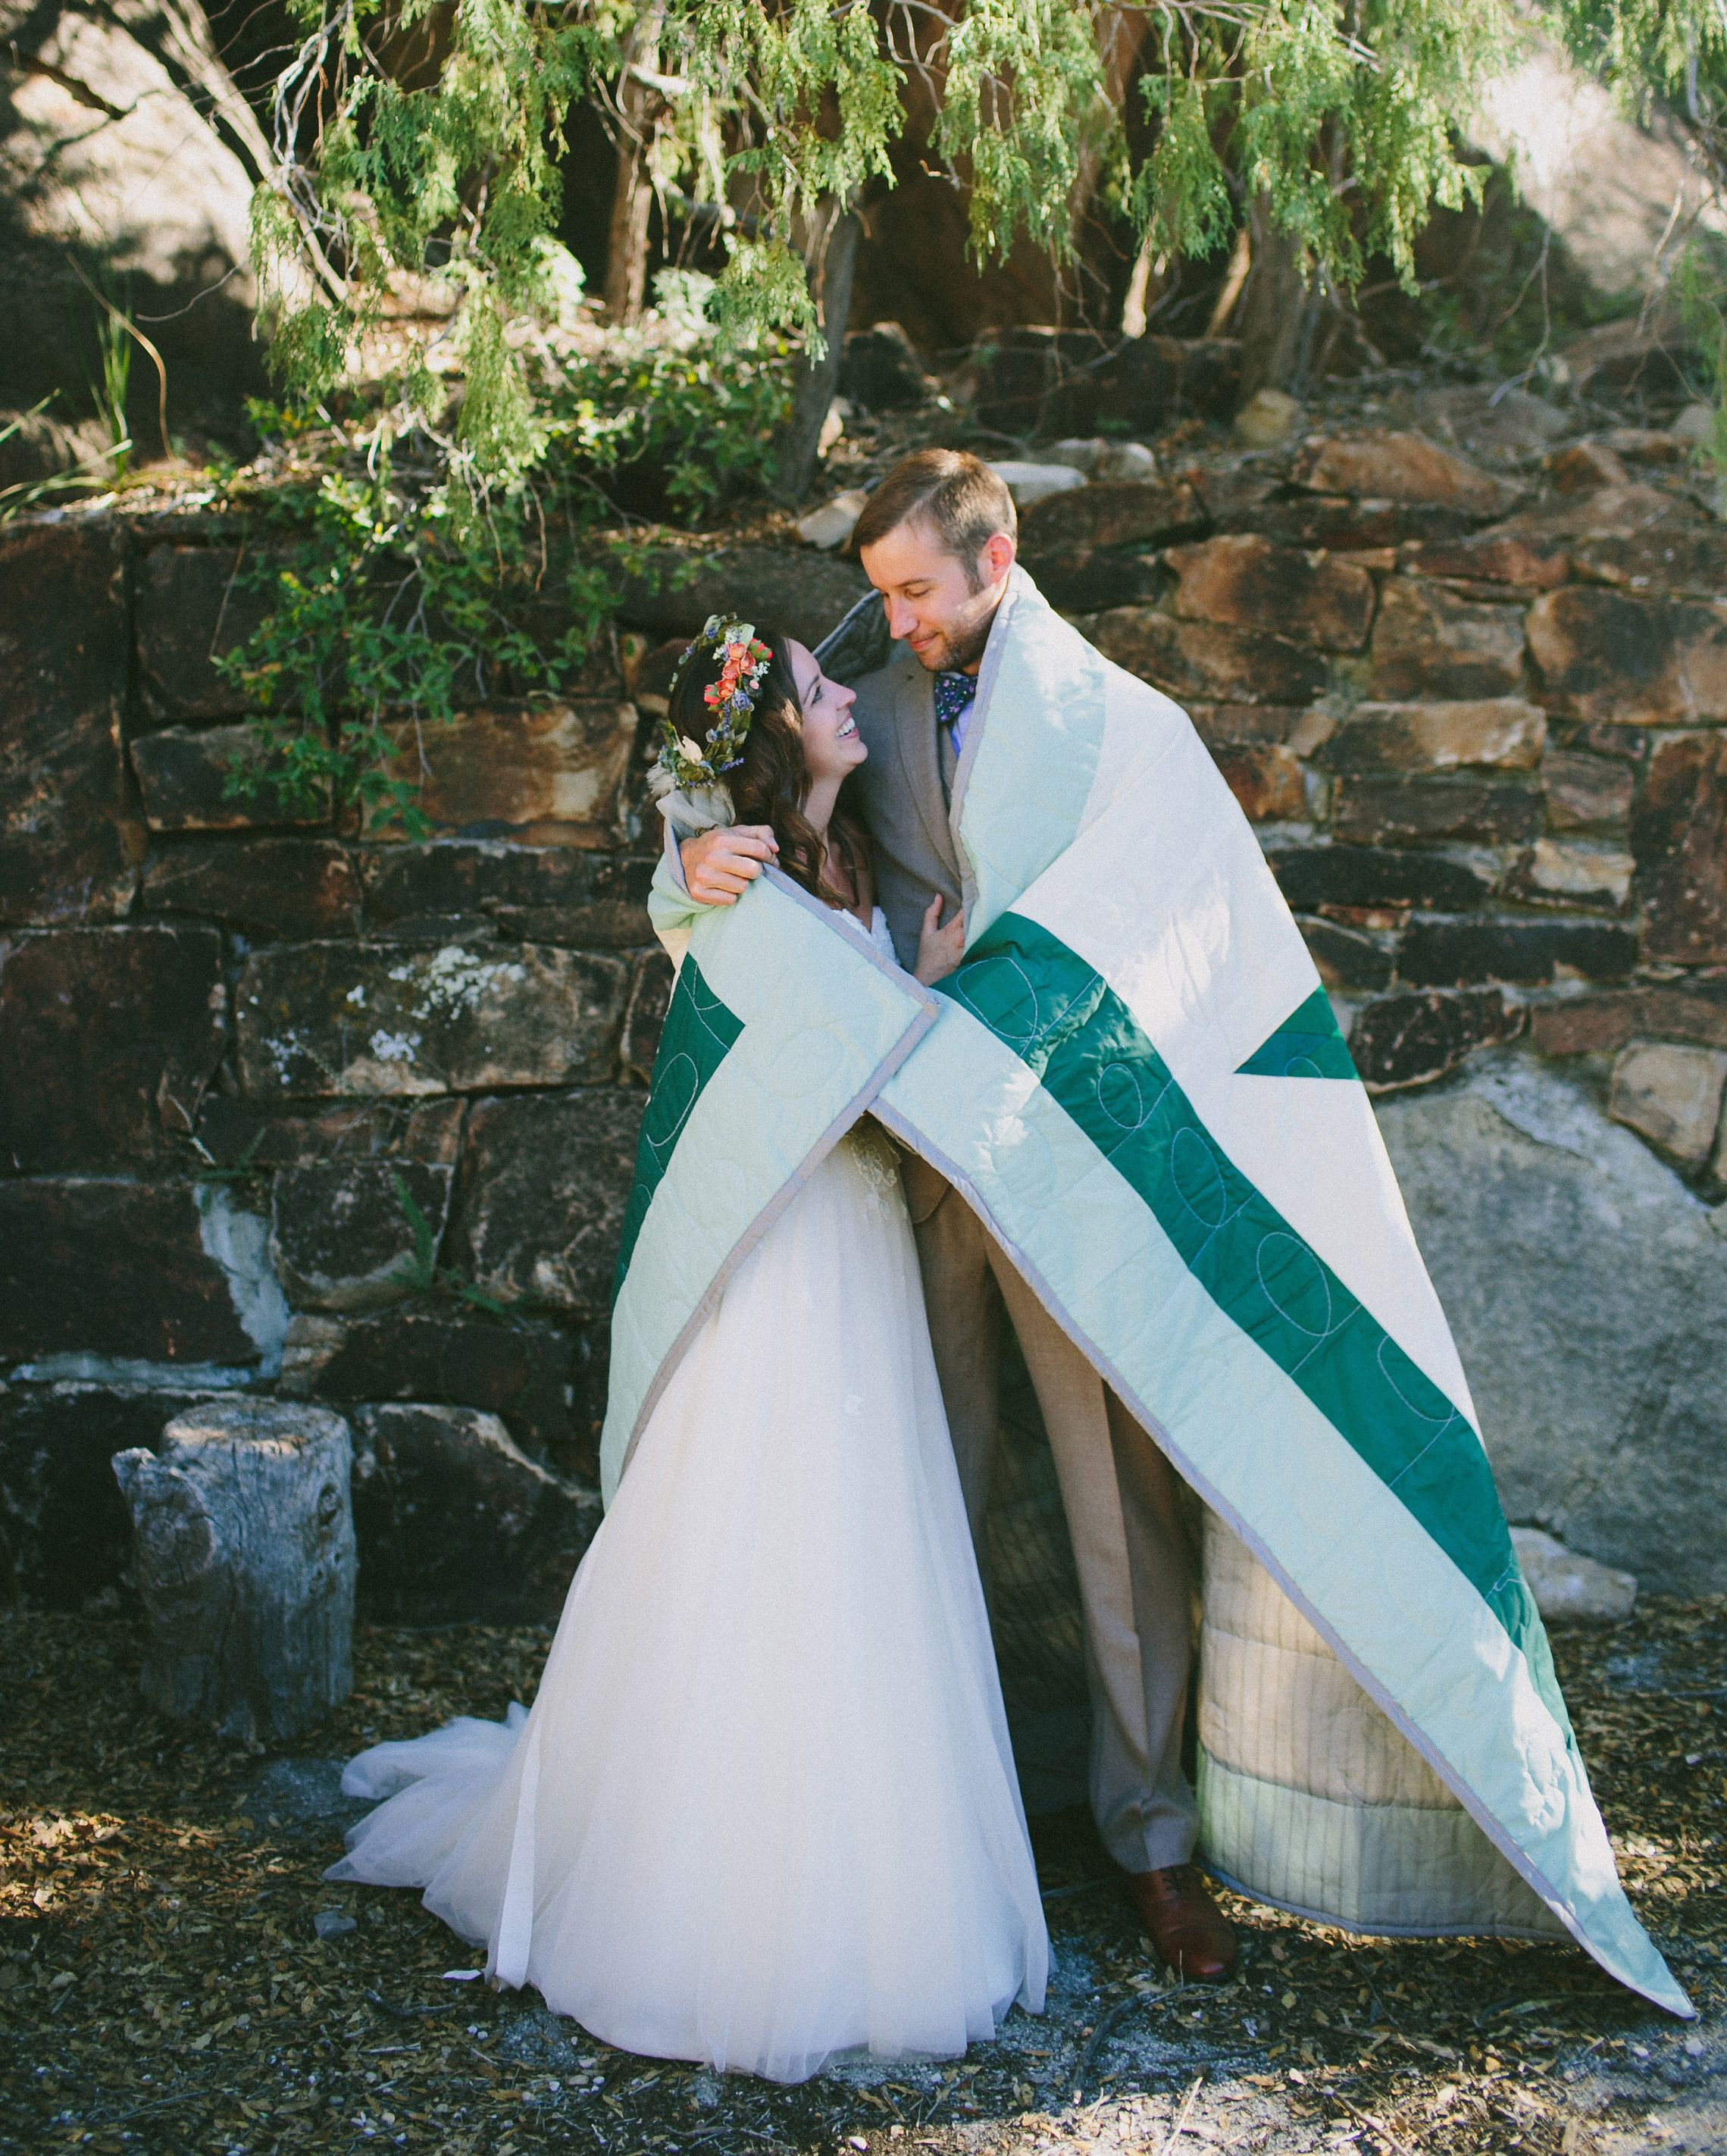 25 Creative Wedding Rituals That Symbolize Unity Native American Wedding Traditions Wedding Ceremony Unity Native American Wedding